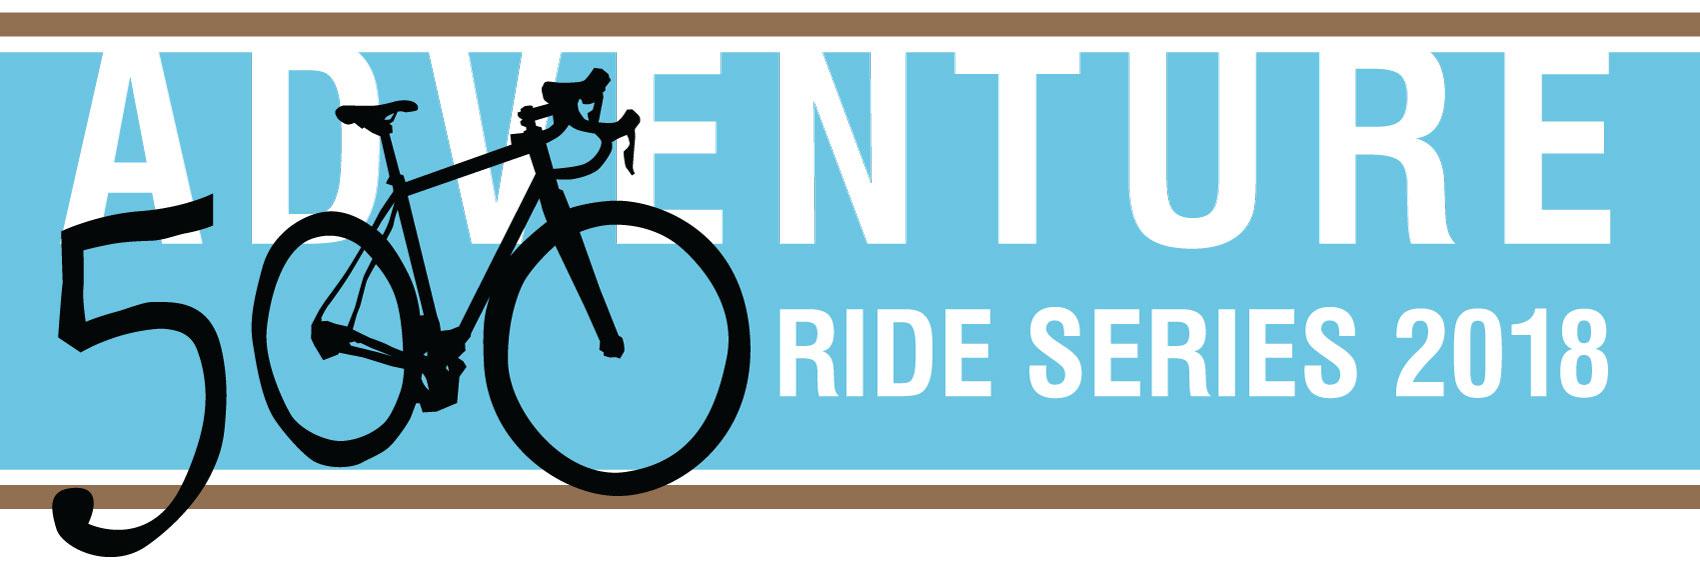 Adventure-500-Ride-Series-Logo-horizontal-180406.jpg